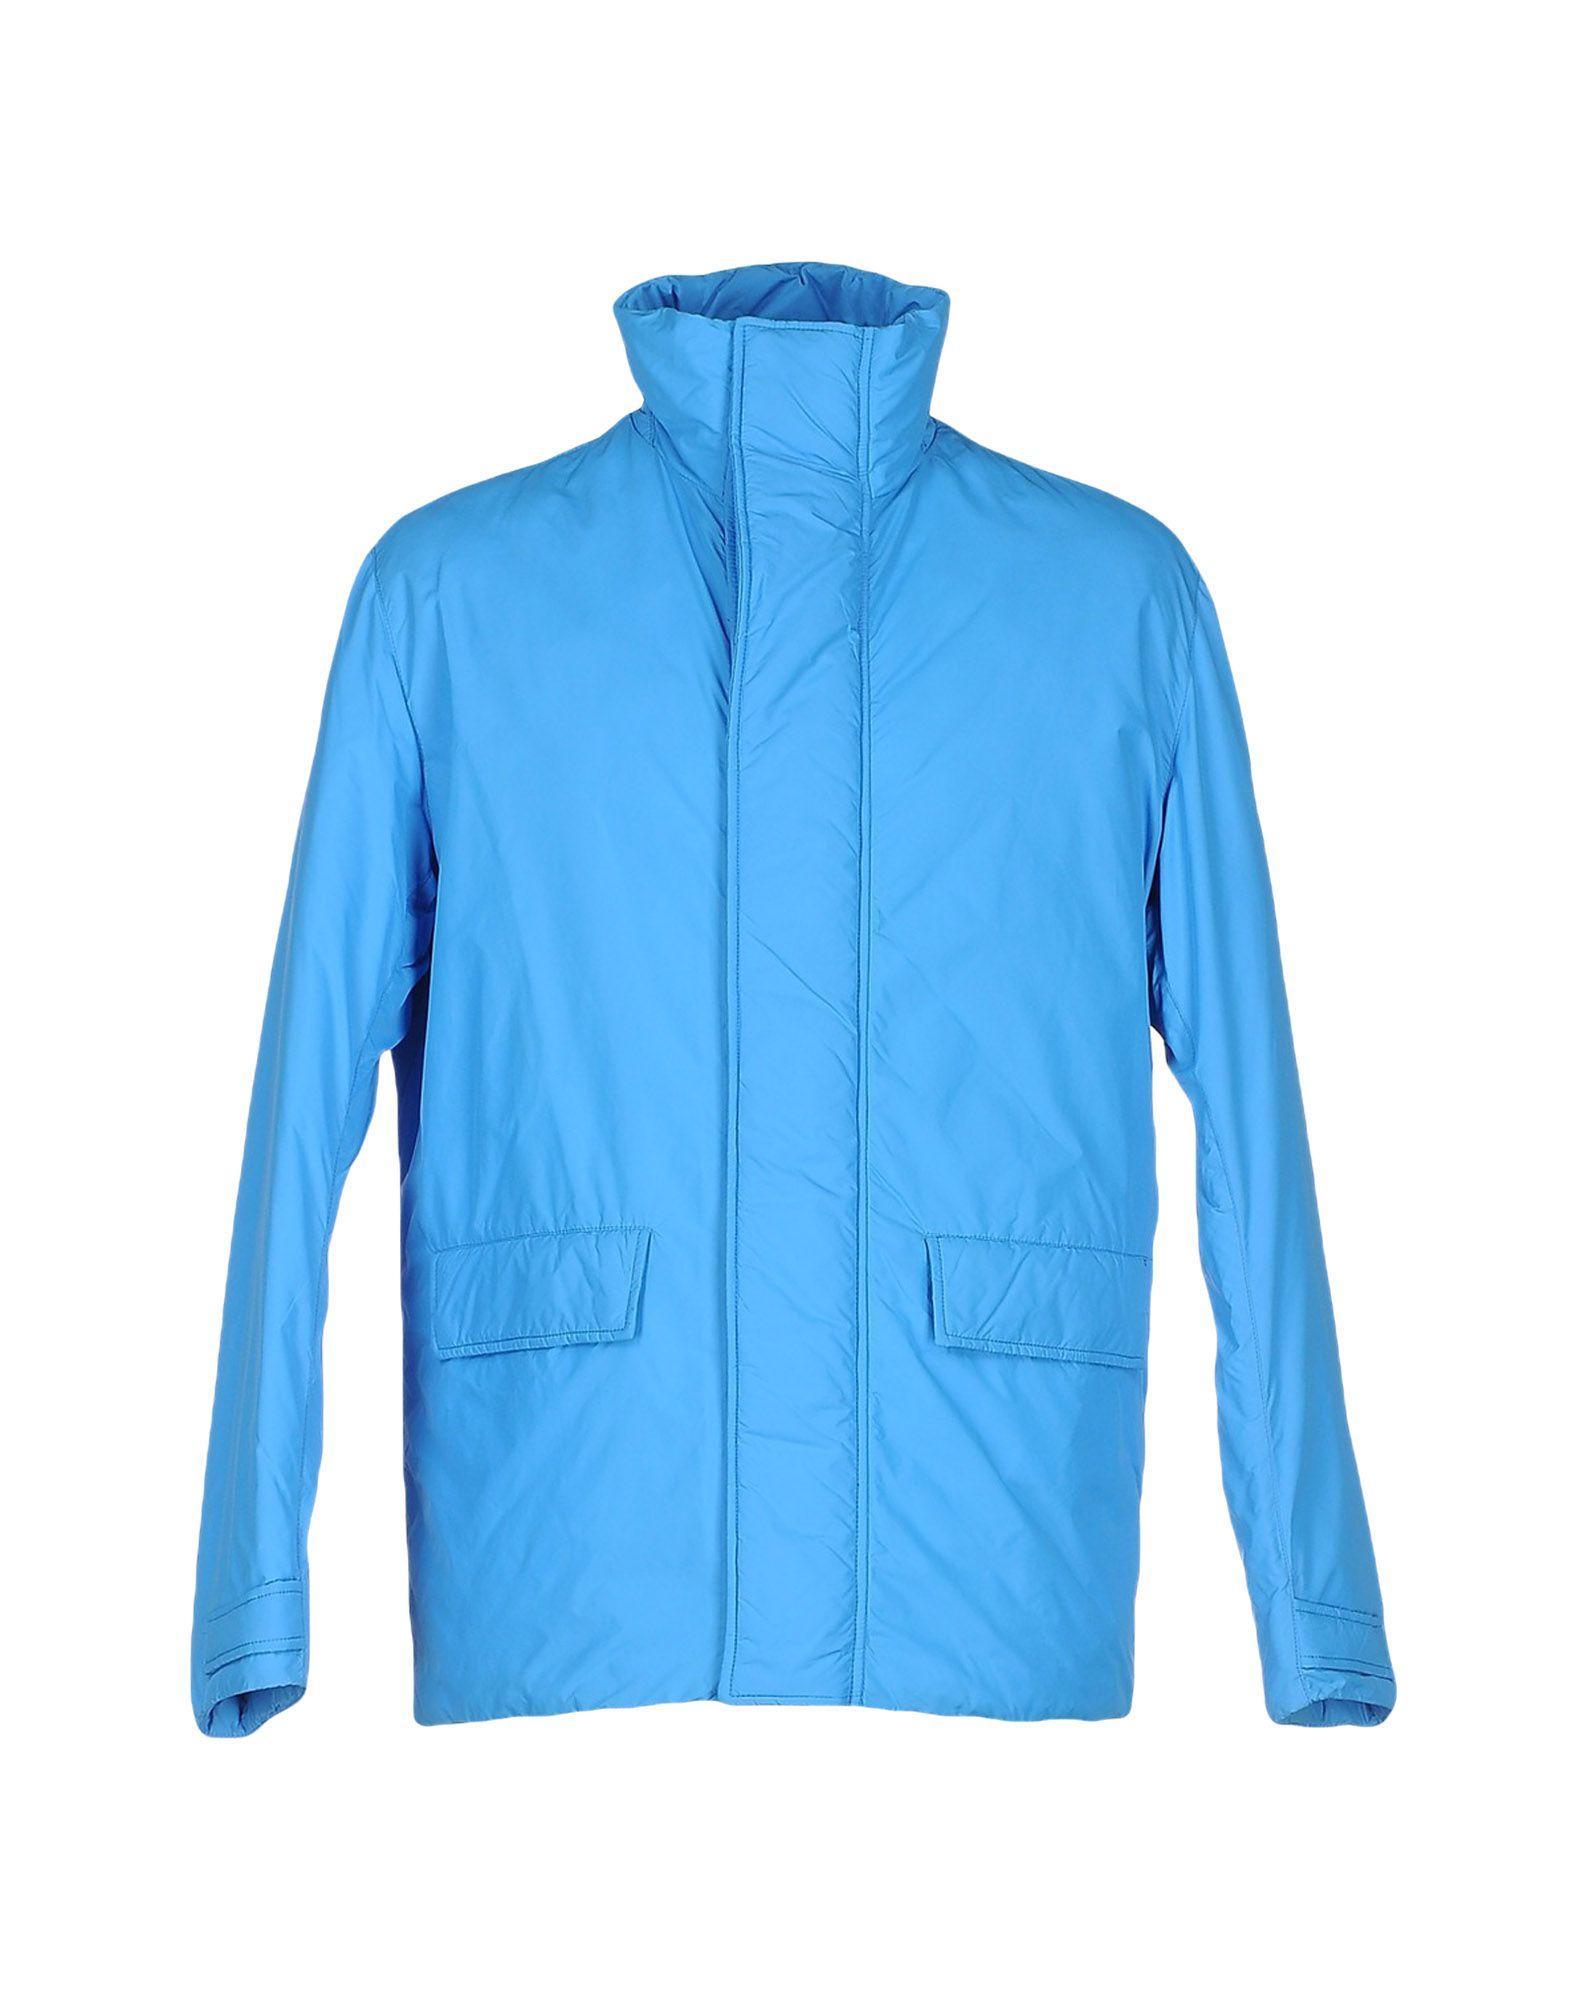 Colmar Originals Down Jacket In Azure